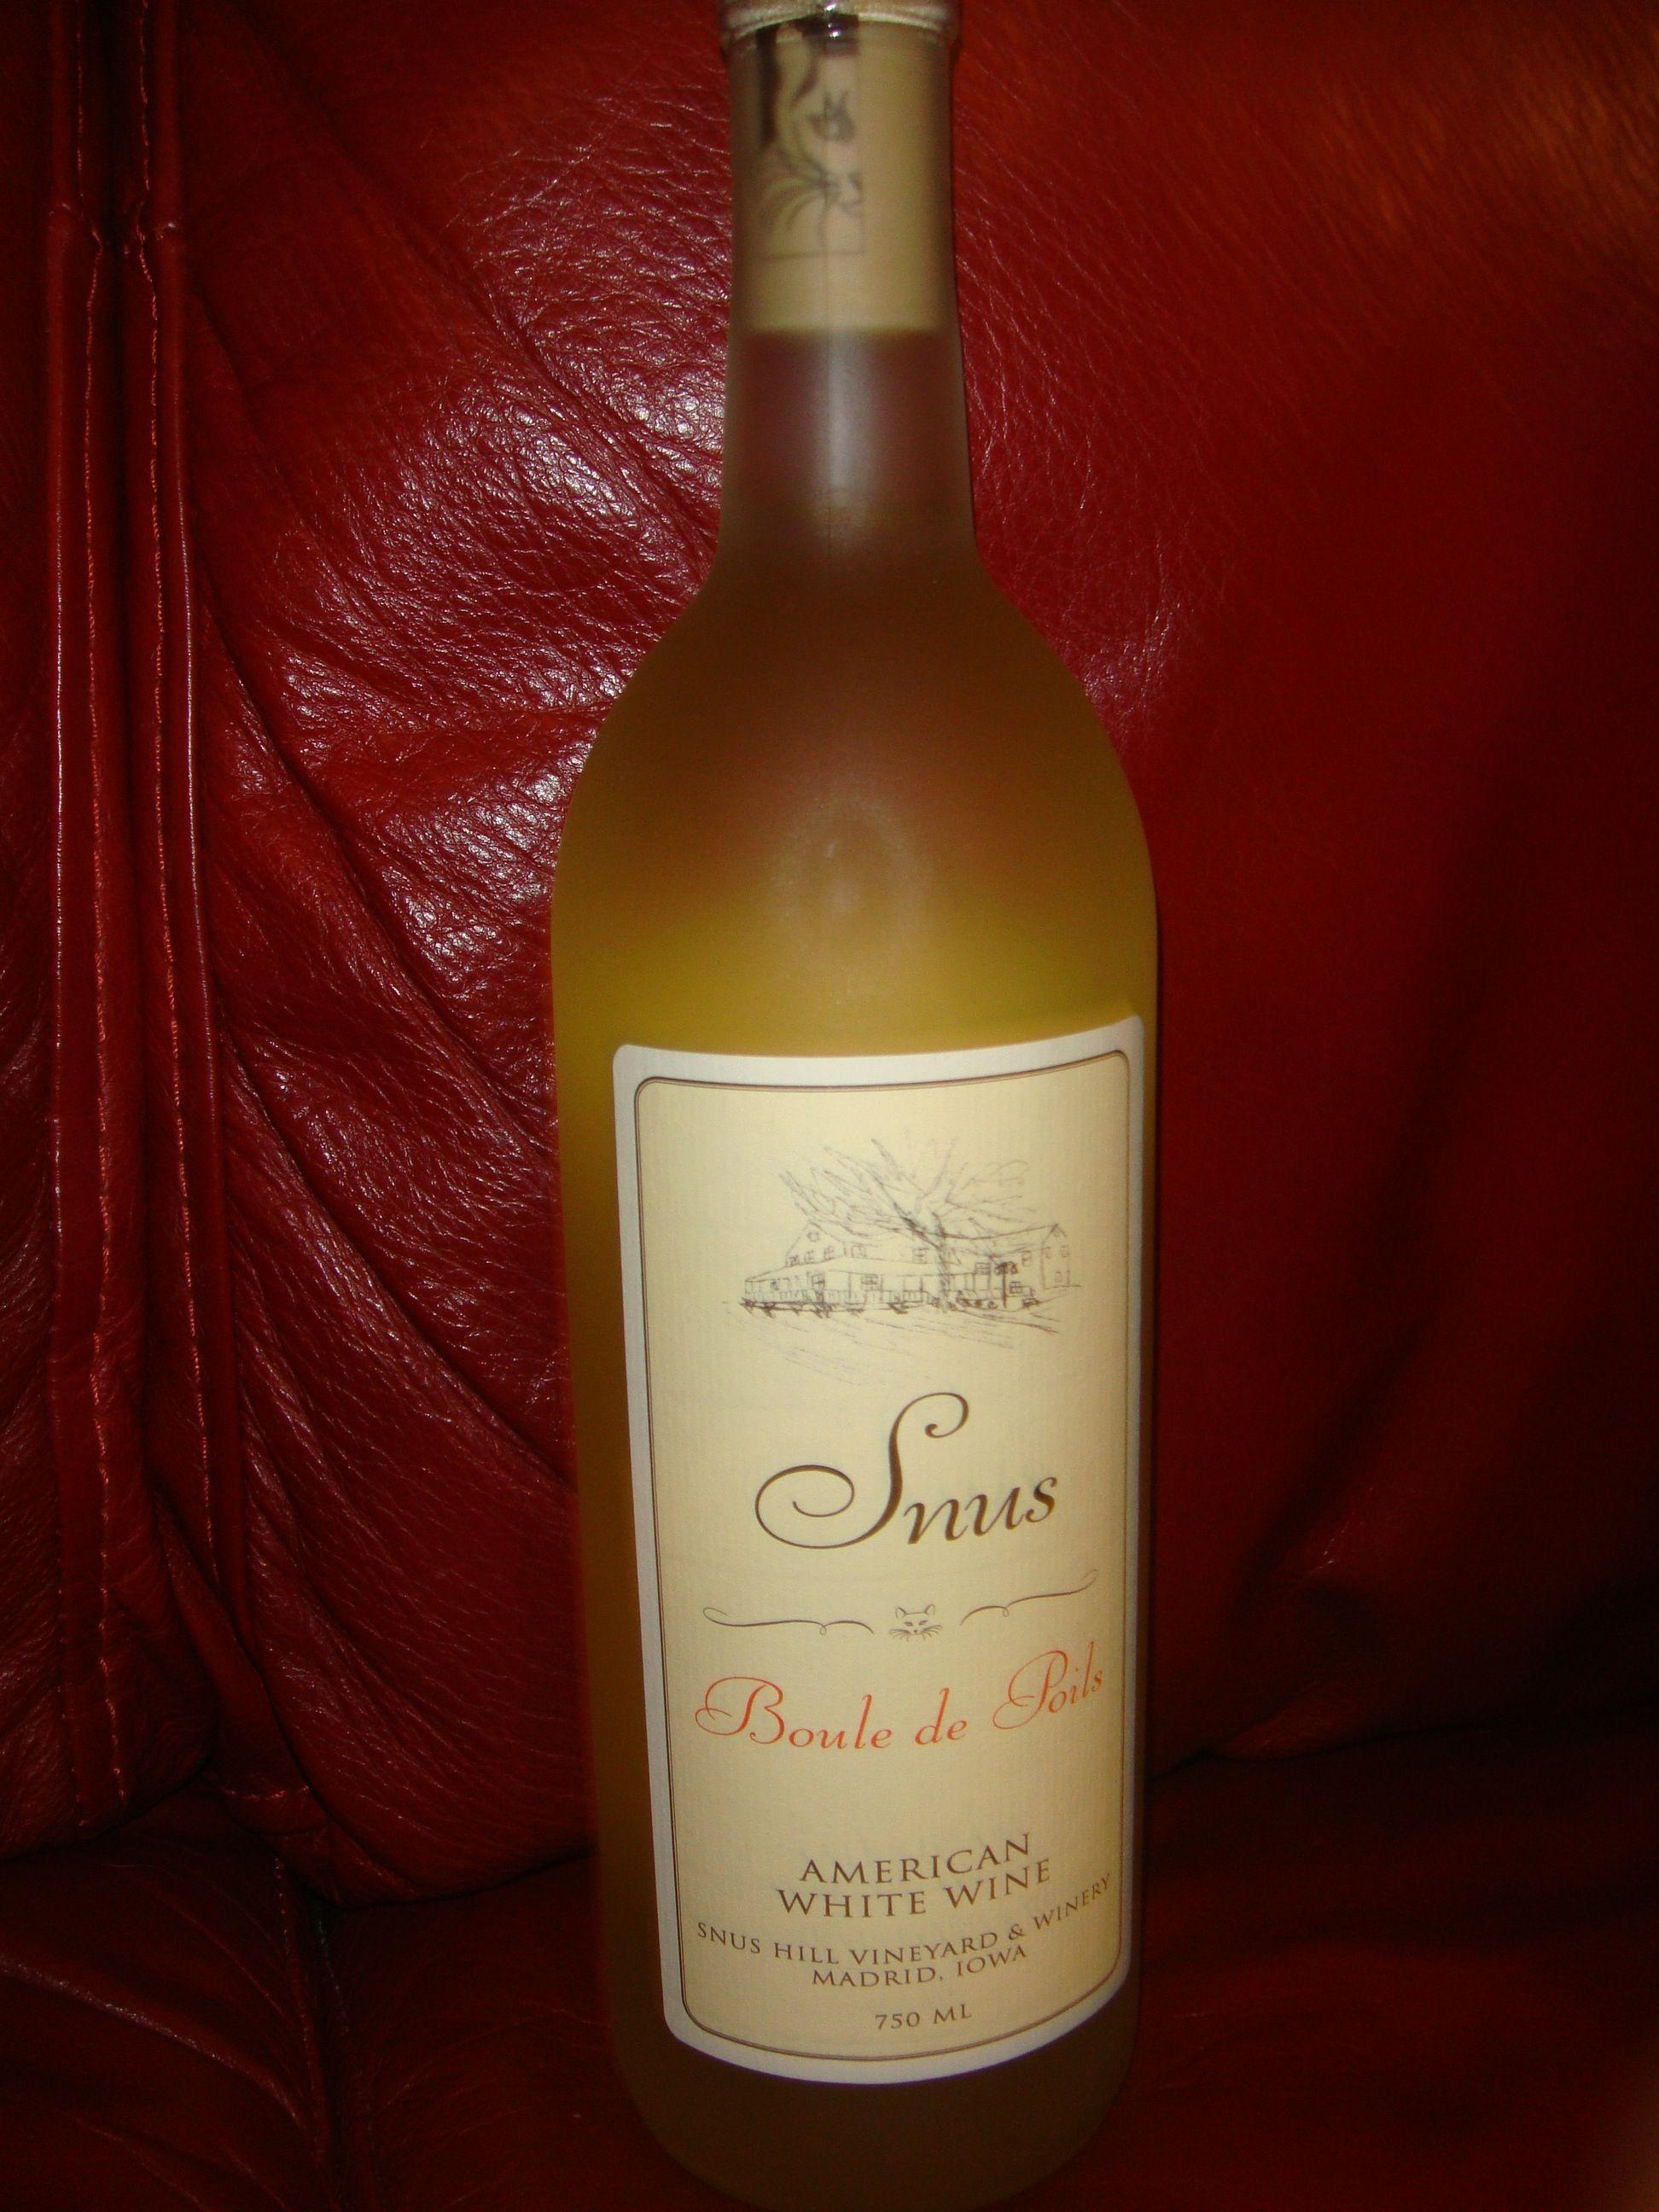 Boule De Poils American White Wine By Snus Hill Vineyard Winery White Wine Wine Wine Bottle